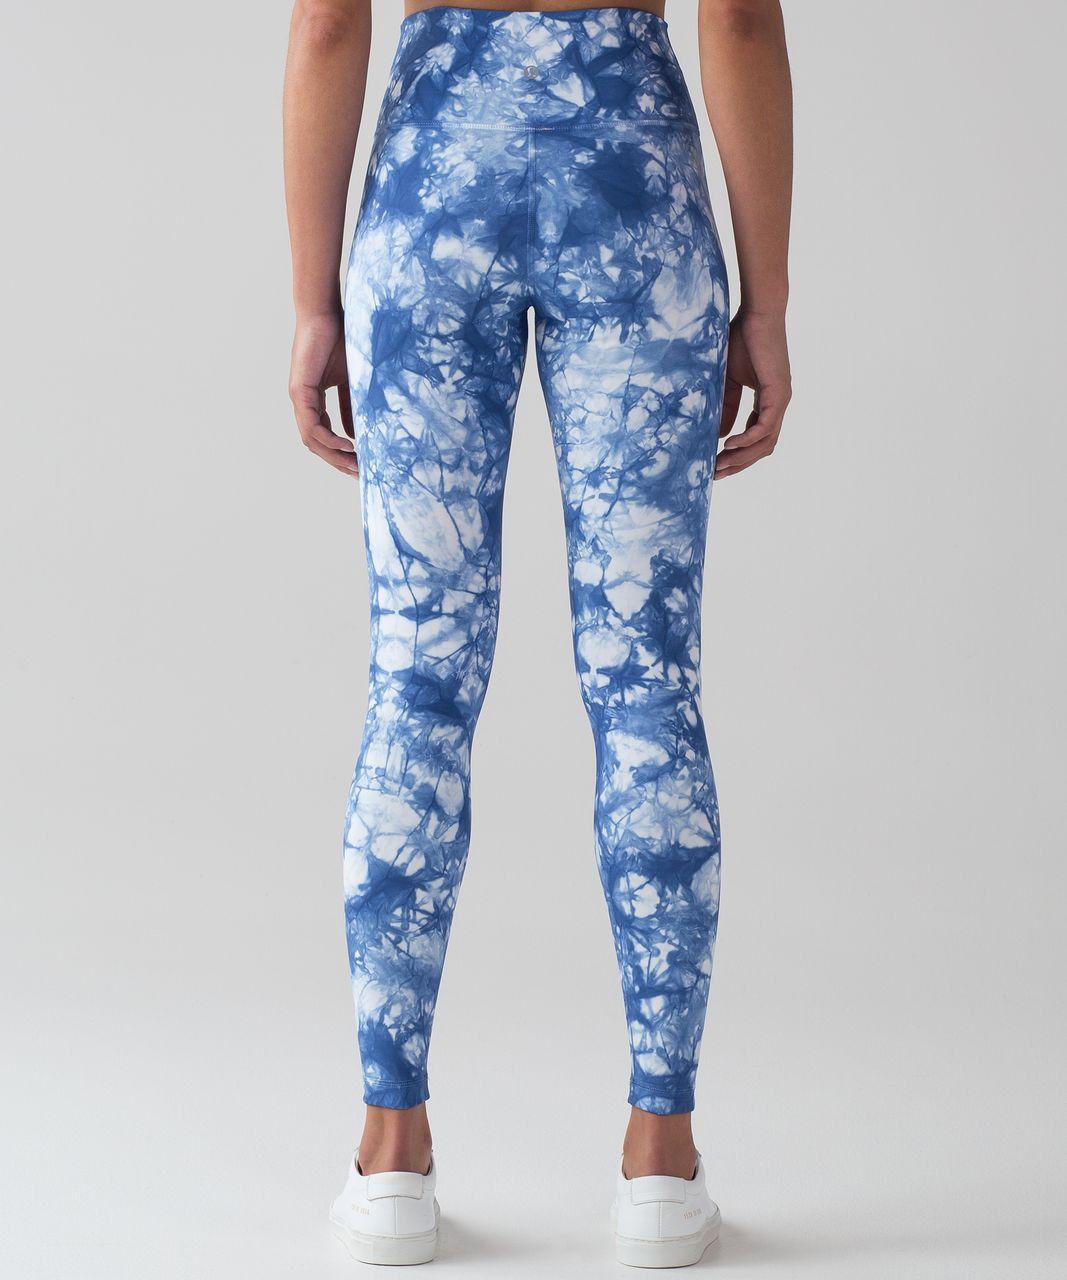 33f2d9e2ae Lululemon Wunder Under Pant (Hi-Rise) Shibori - Shibori Varsity Blue White